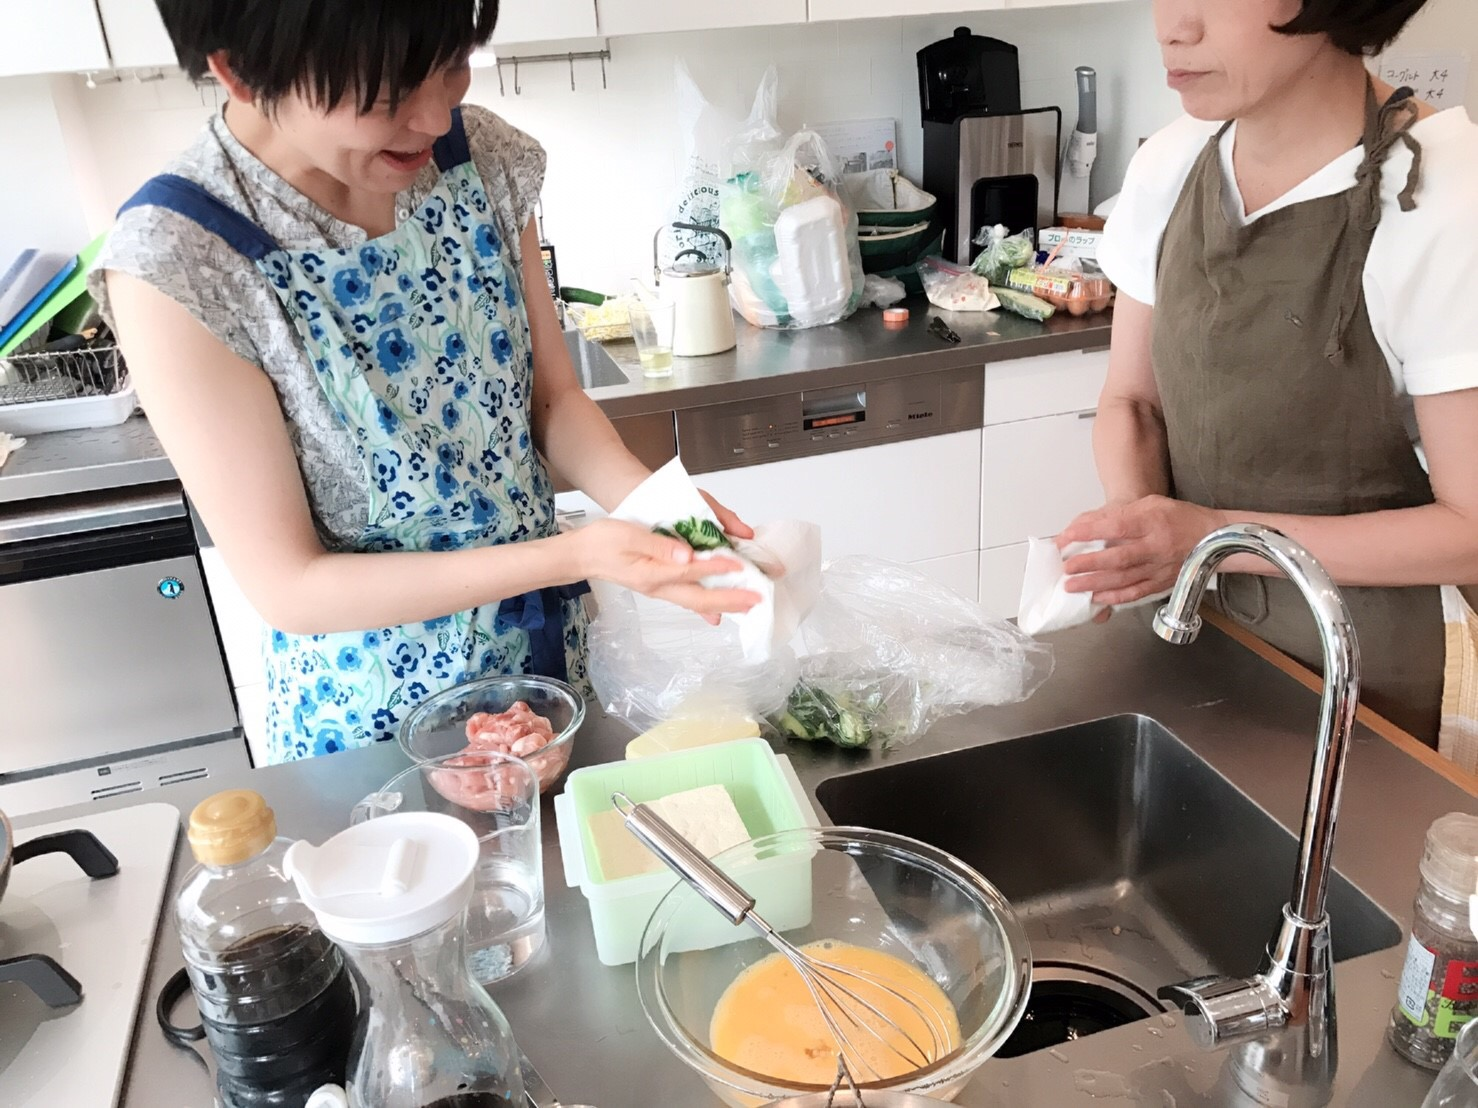 a-ta-sante糖質制限パン料理教室。7月度『糖質制限家庭料理教室』プライベートレッスン、大盛況で終了。阿倍野区西田辺。